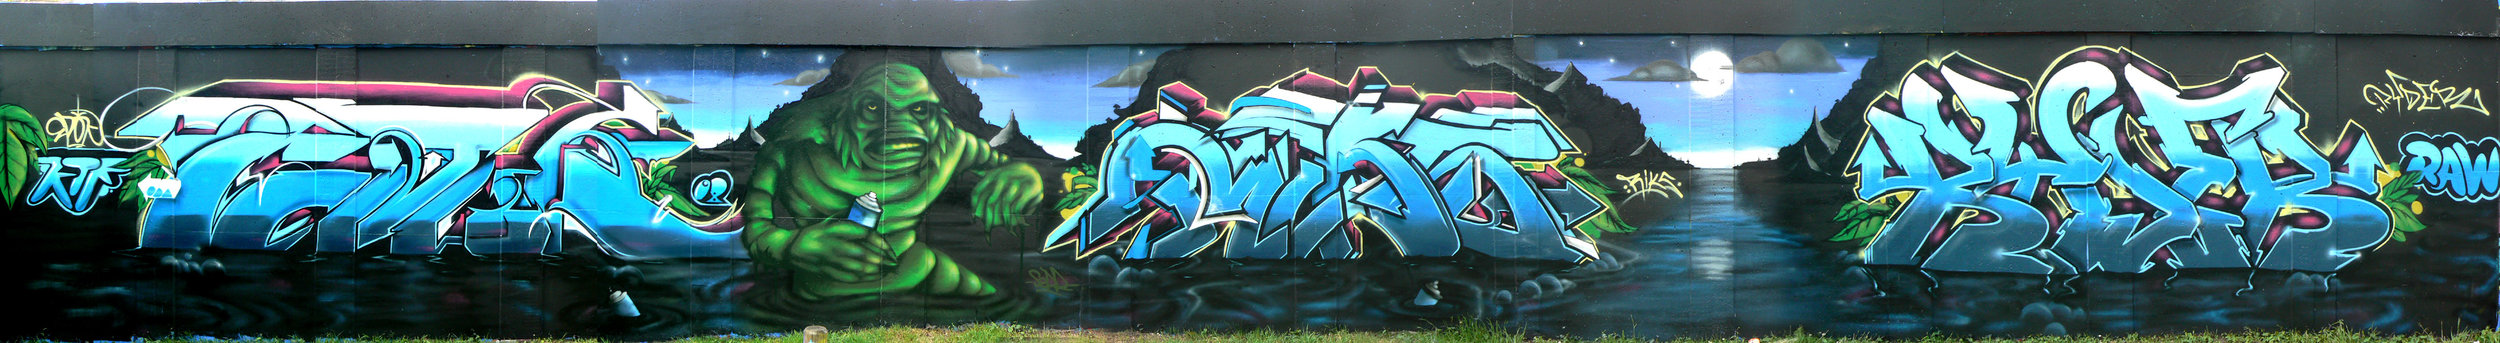 Bristol '08. With Epok, Riks, Ryder